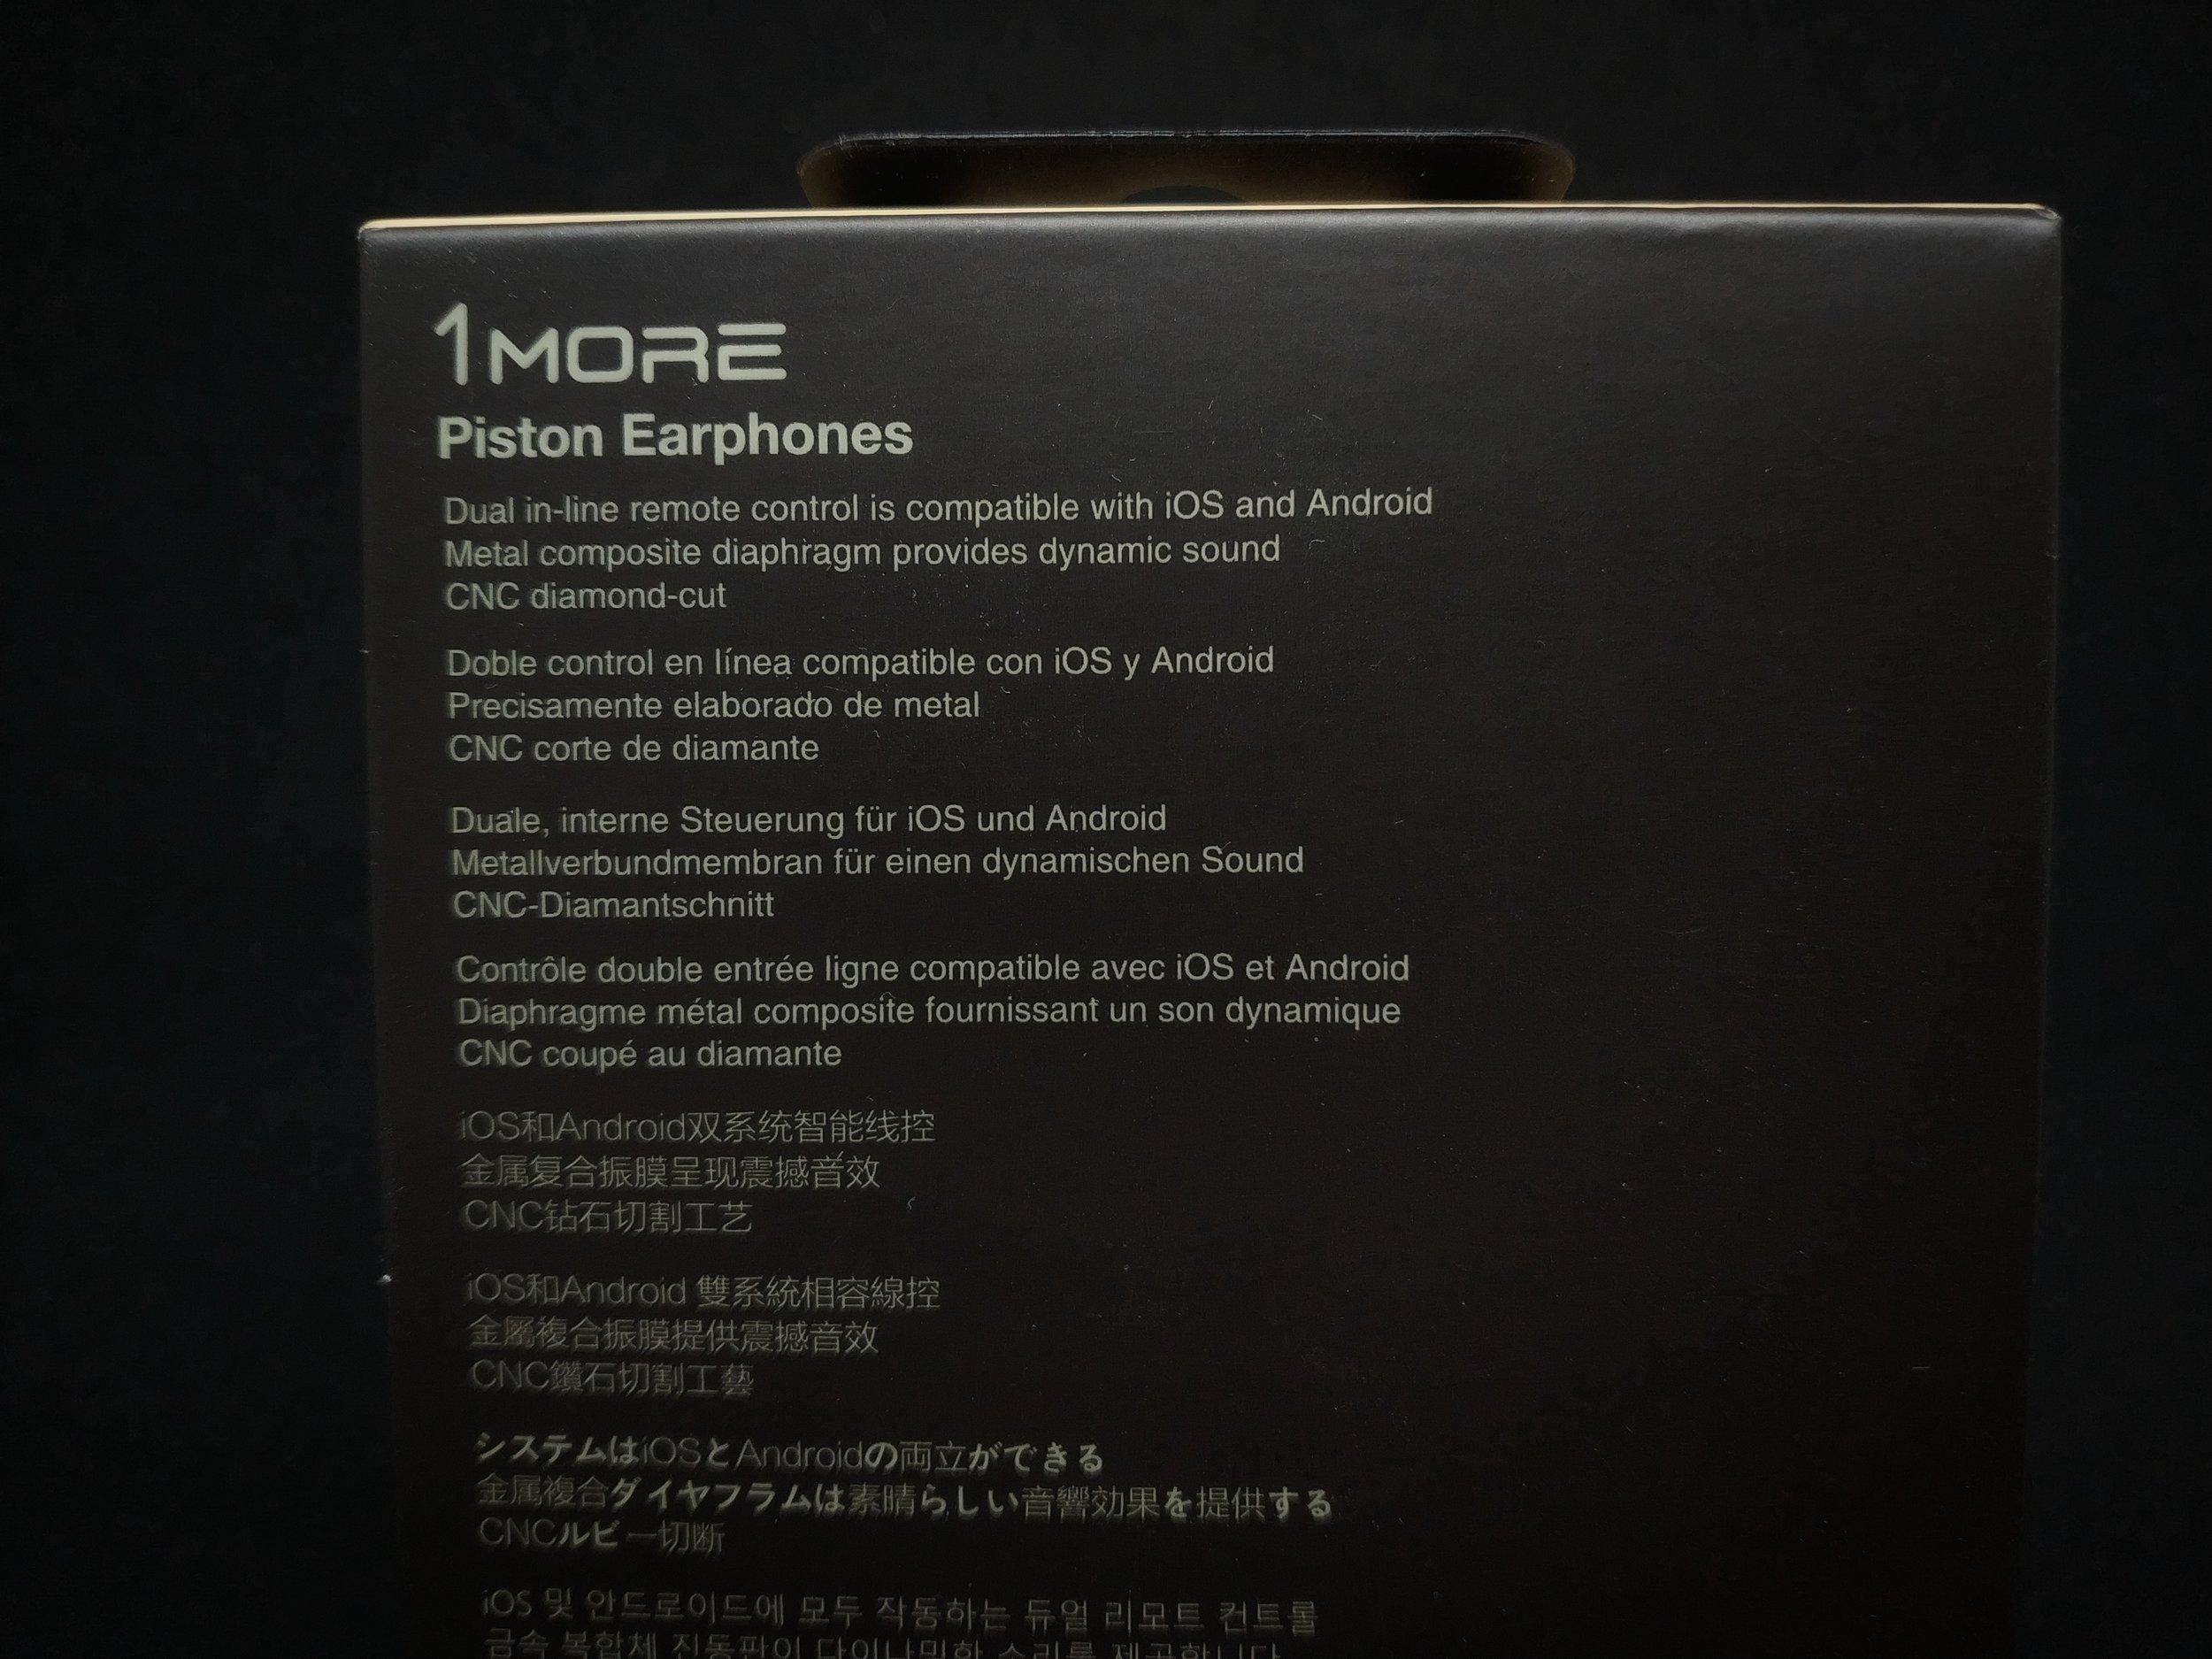 1more e0320 packaging back 2.jpeg